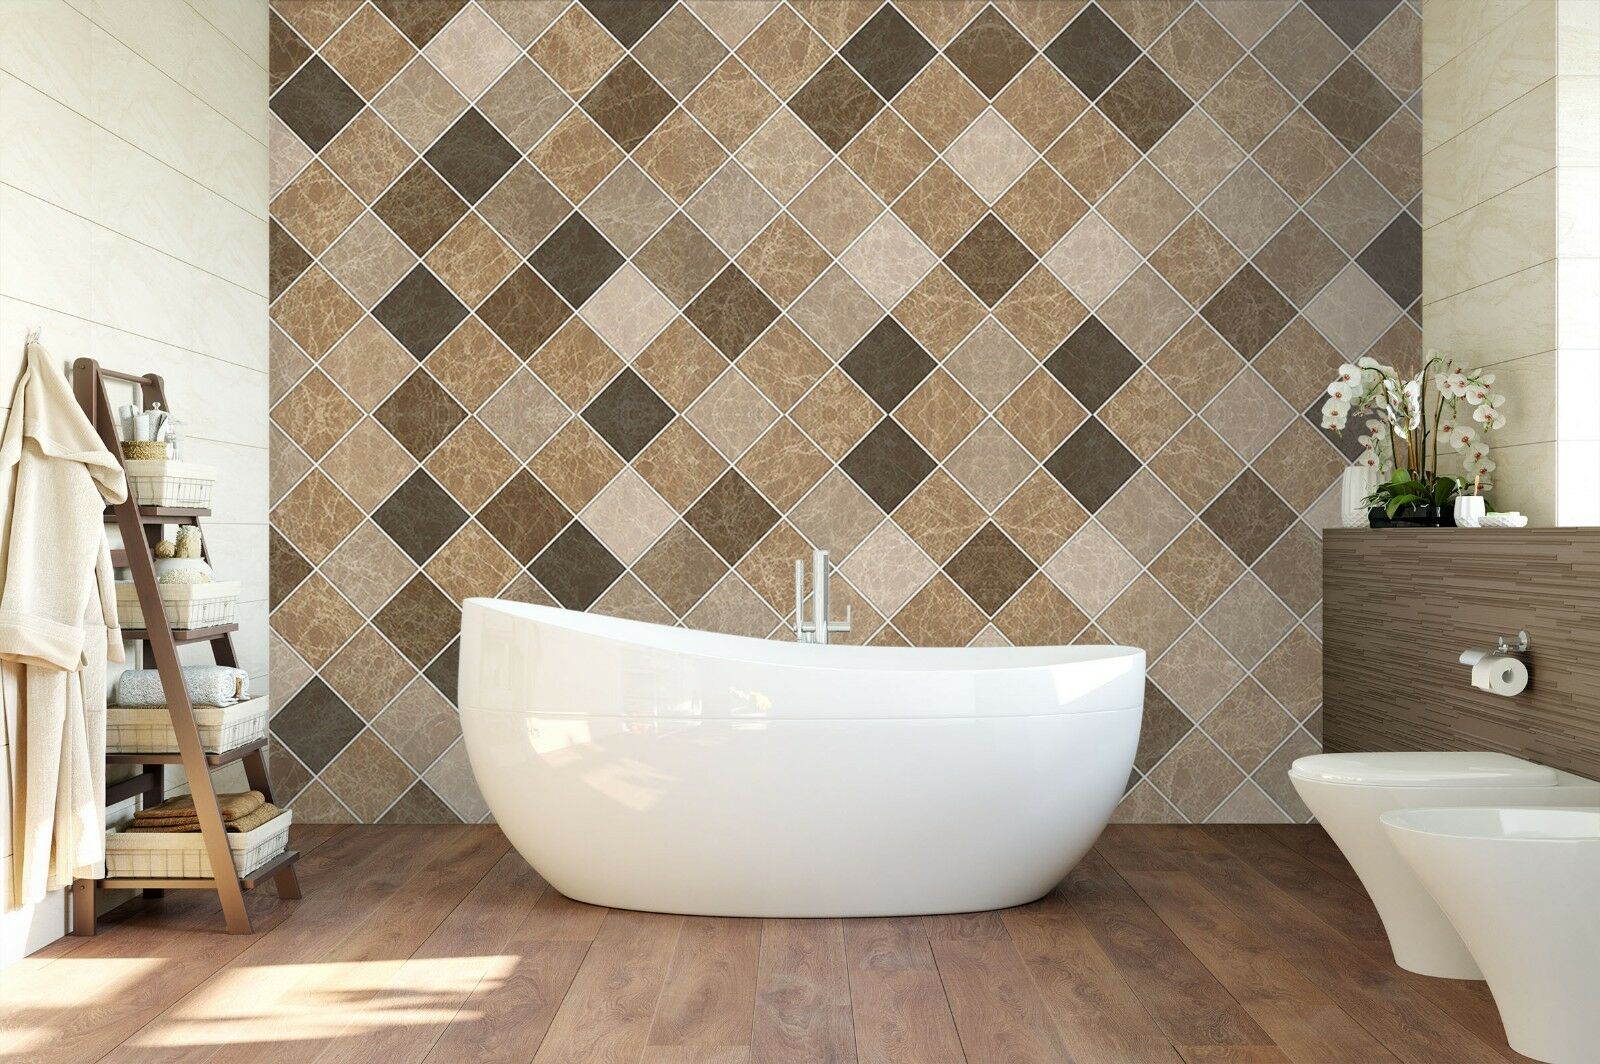 3D Square Mosaic 822 Texture Tiles Marble Wall Paper Decal Wallpaper Mural AJ